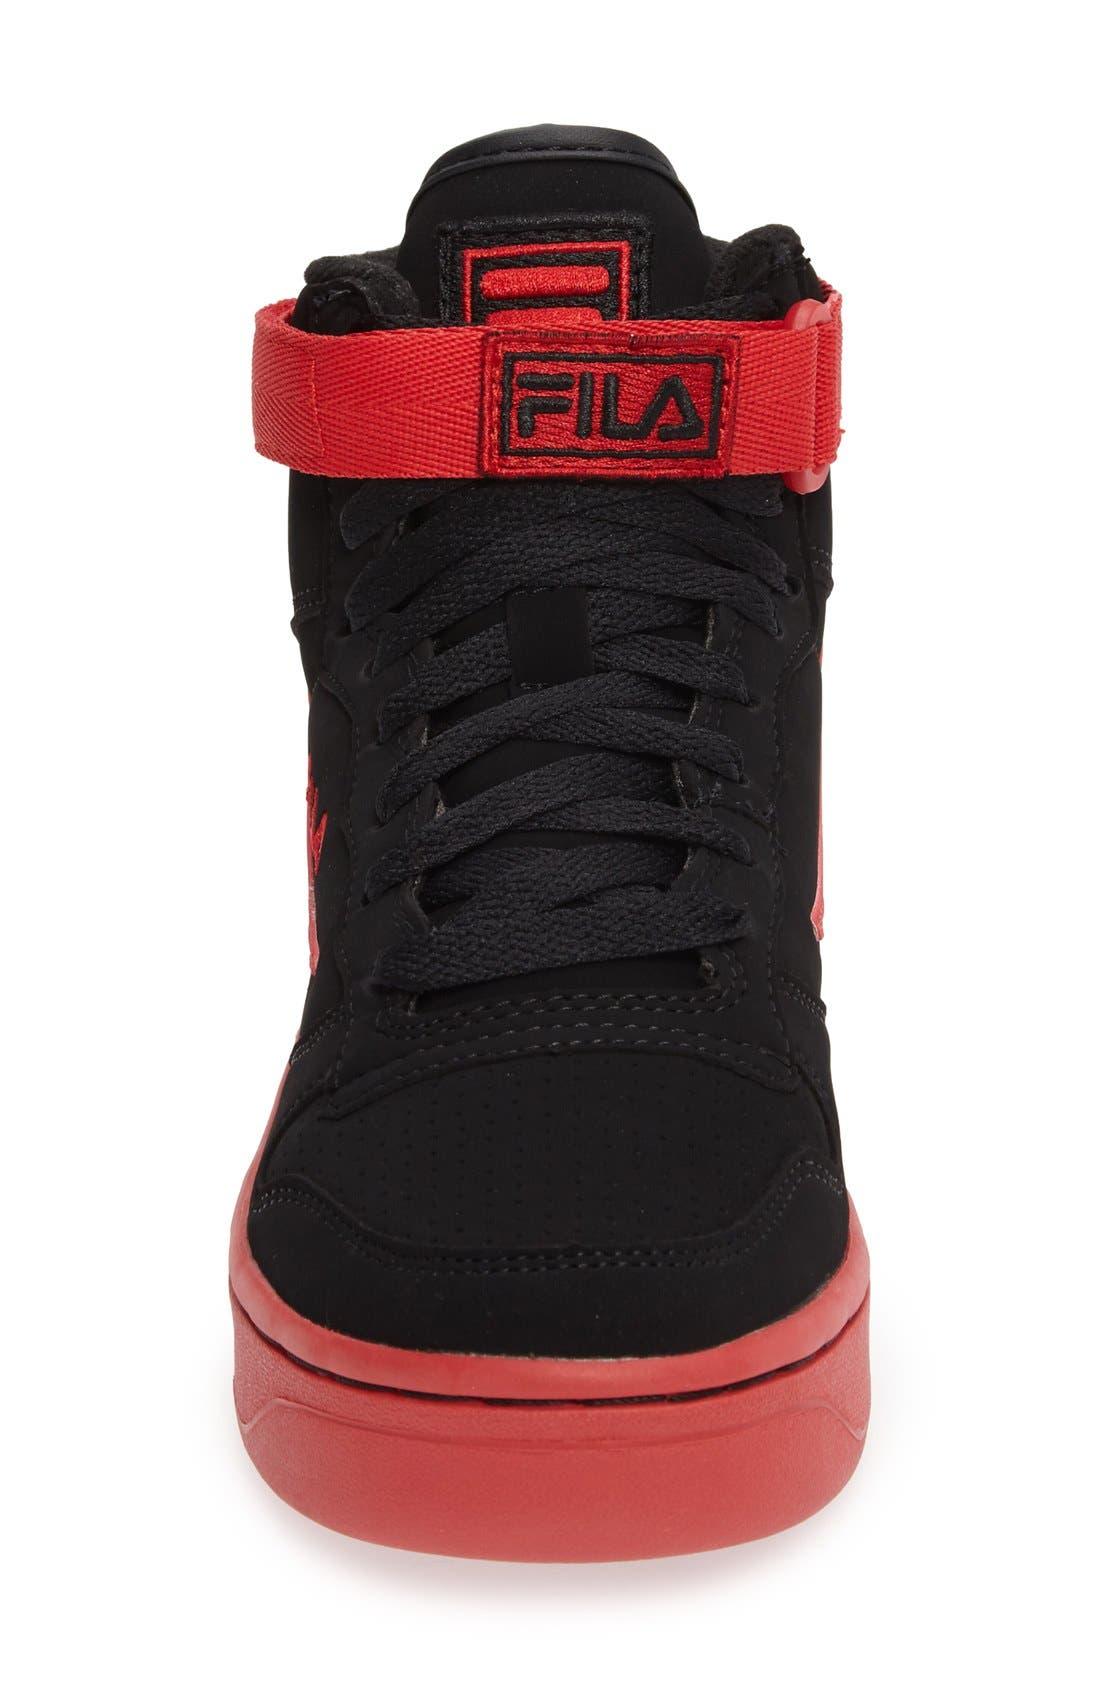 USA FX-100 High Top Sneaker,                             Alternate thumbnail 8, color,                             001